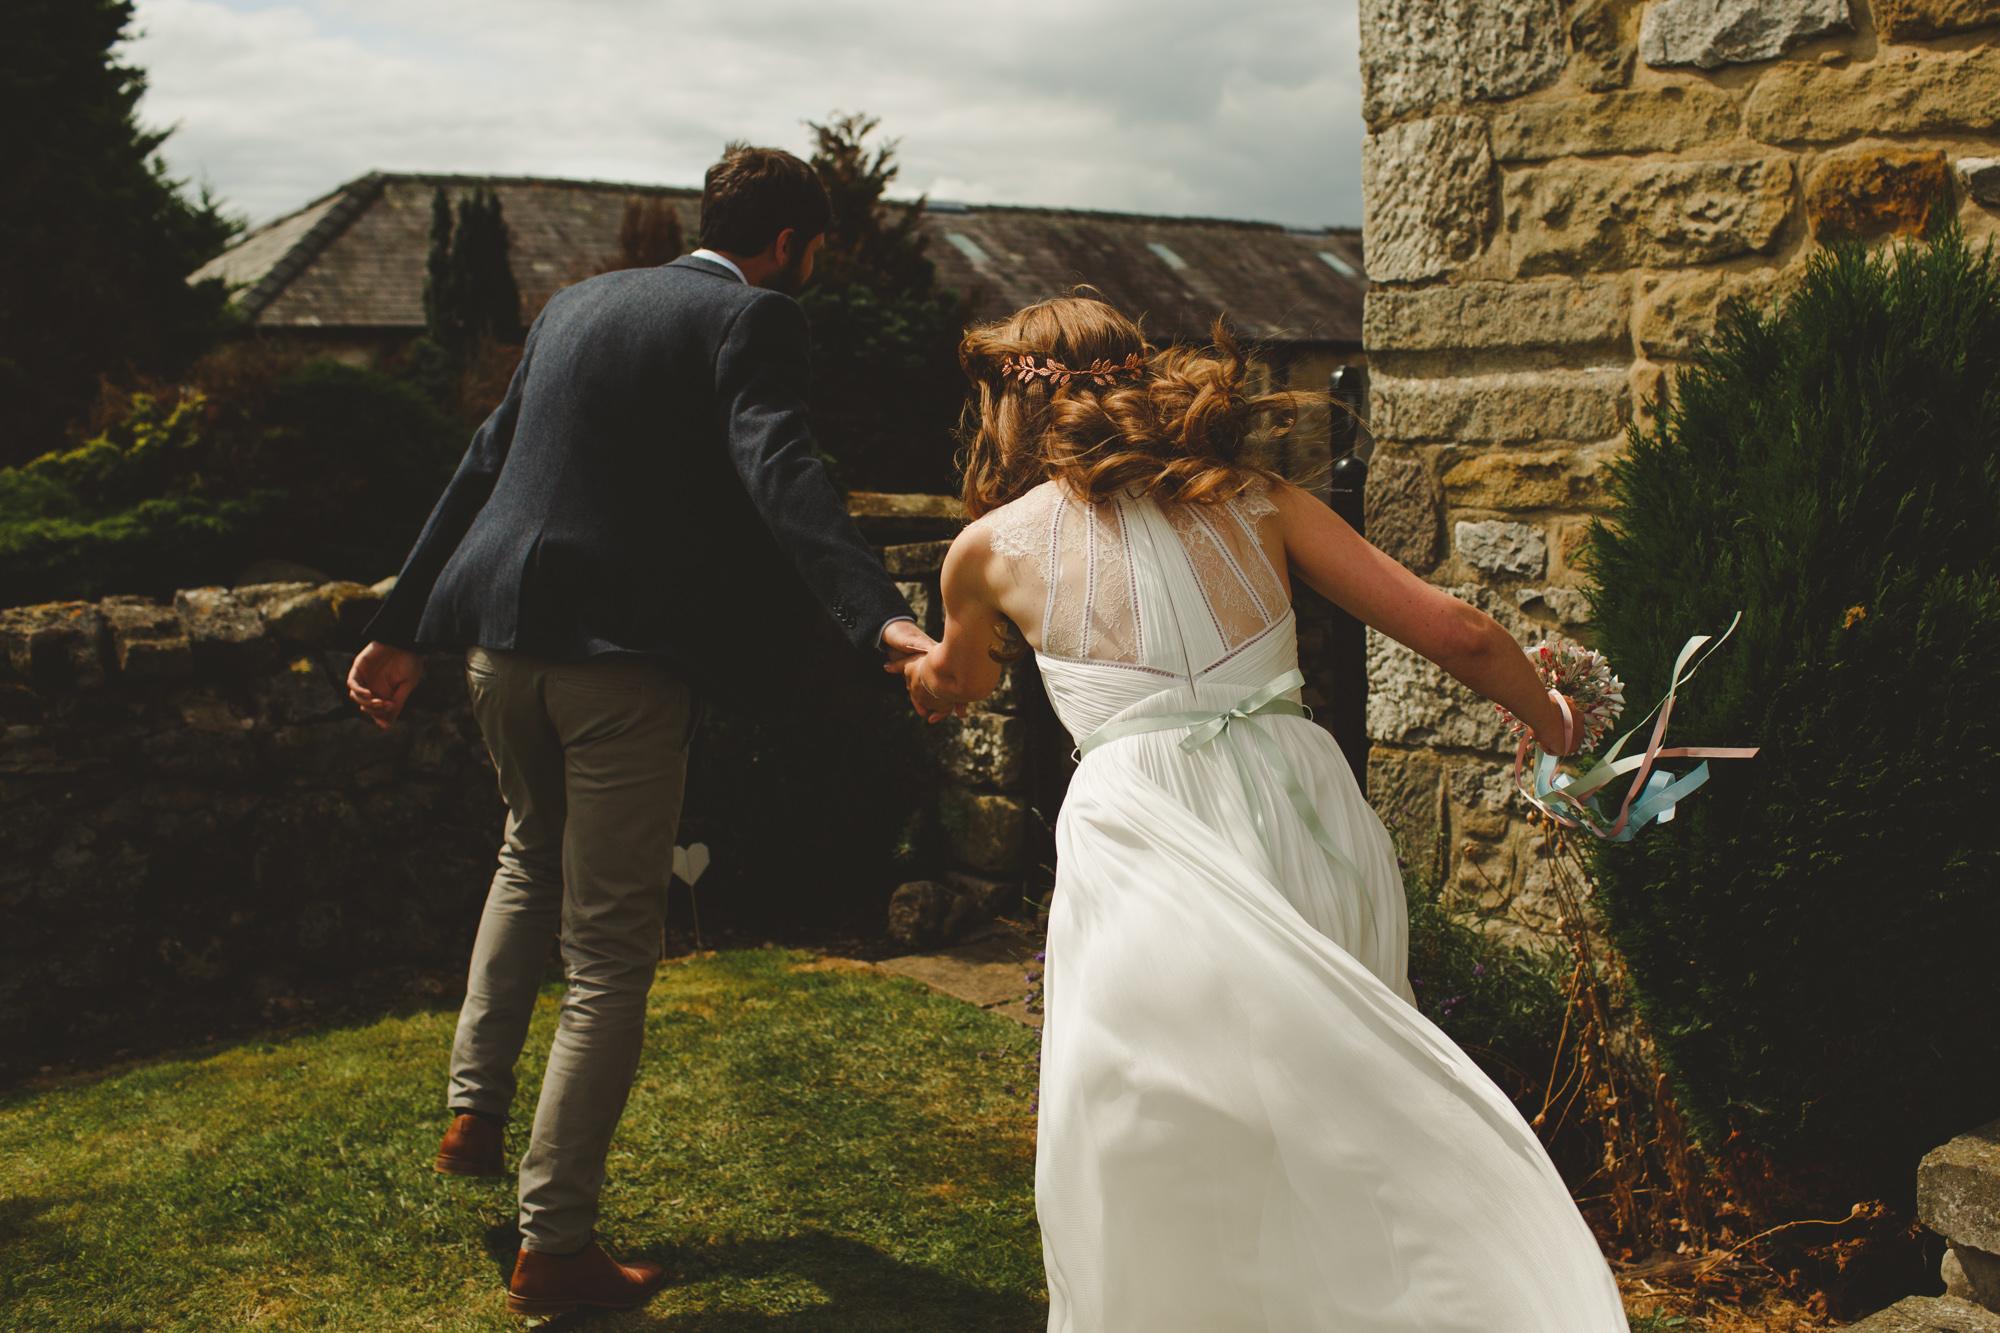 derbyshire-wedding-photographer-filmmaker-carsington-water--5.jpg